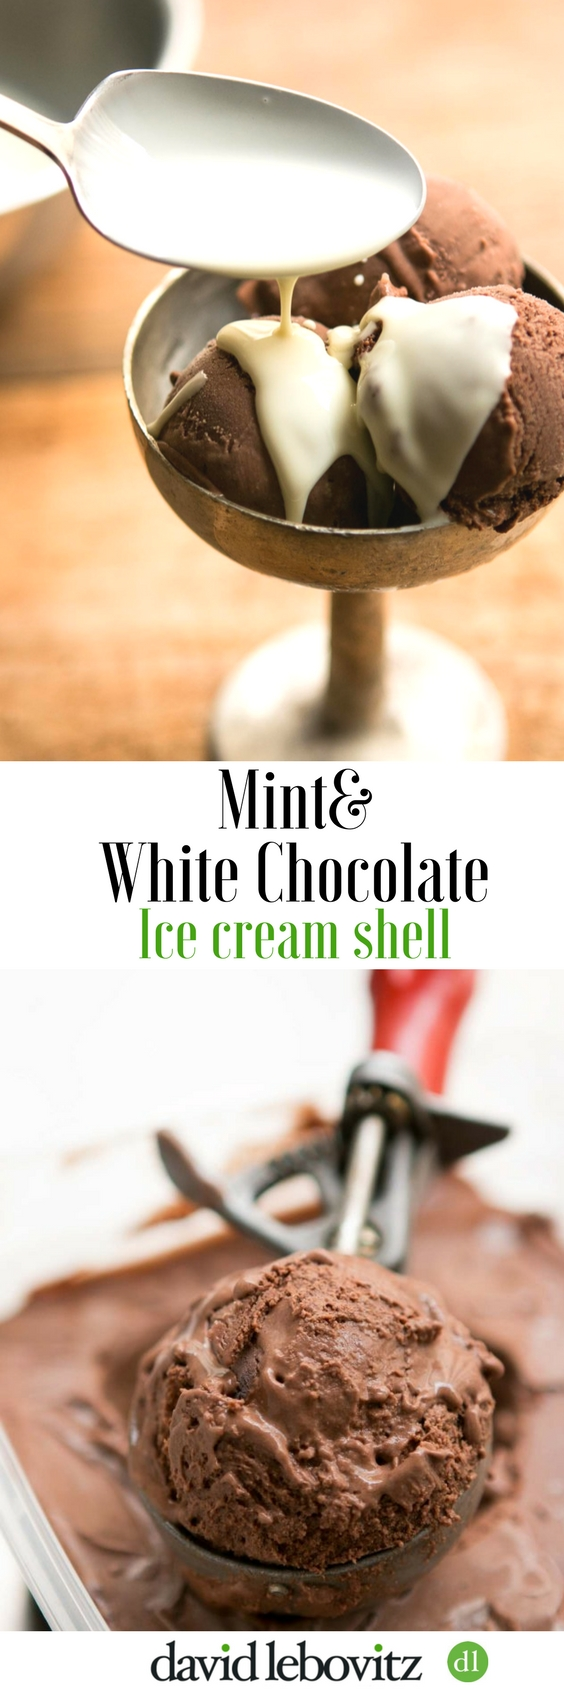 Mint-White Chocolate